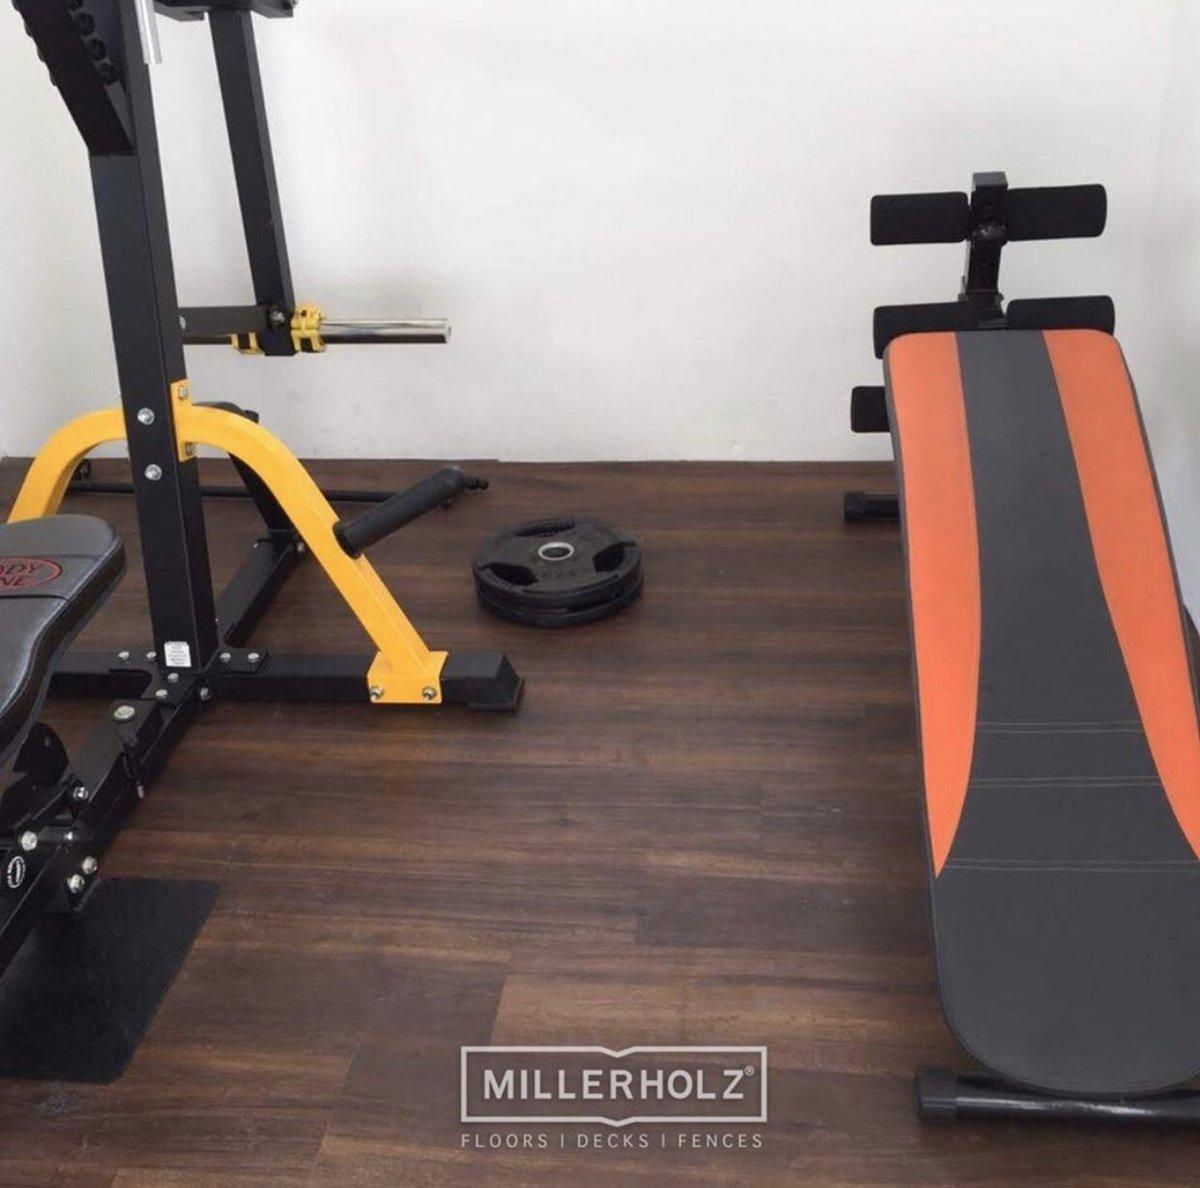 Machines rest easy on our wood-look gym flooring.   https://millerholz.com/flooring/   Call : +94 777 77 1775  #millerholz  #evoherf  #gym  #floor  #flooring  #foottraffic  #hard  #perfect  #workout  #wood  #Interiordesign  #Architecture  #tiles  #vinyl  #carpet  #Lka